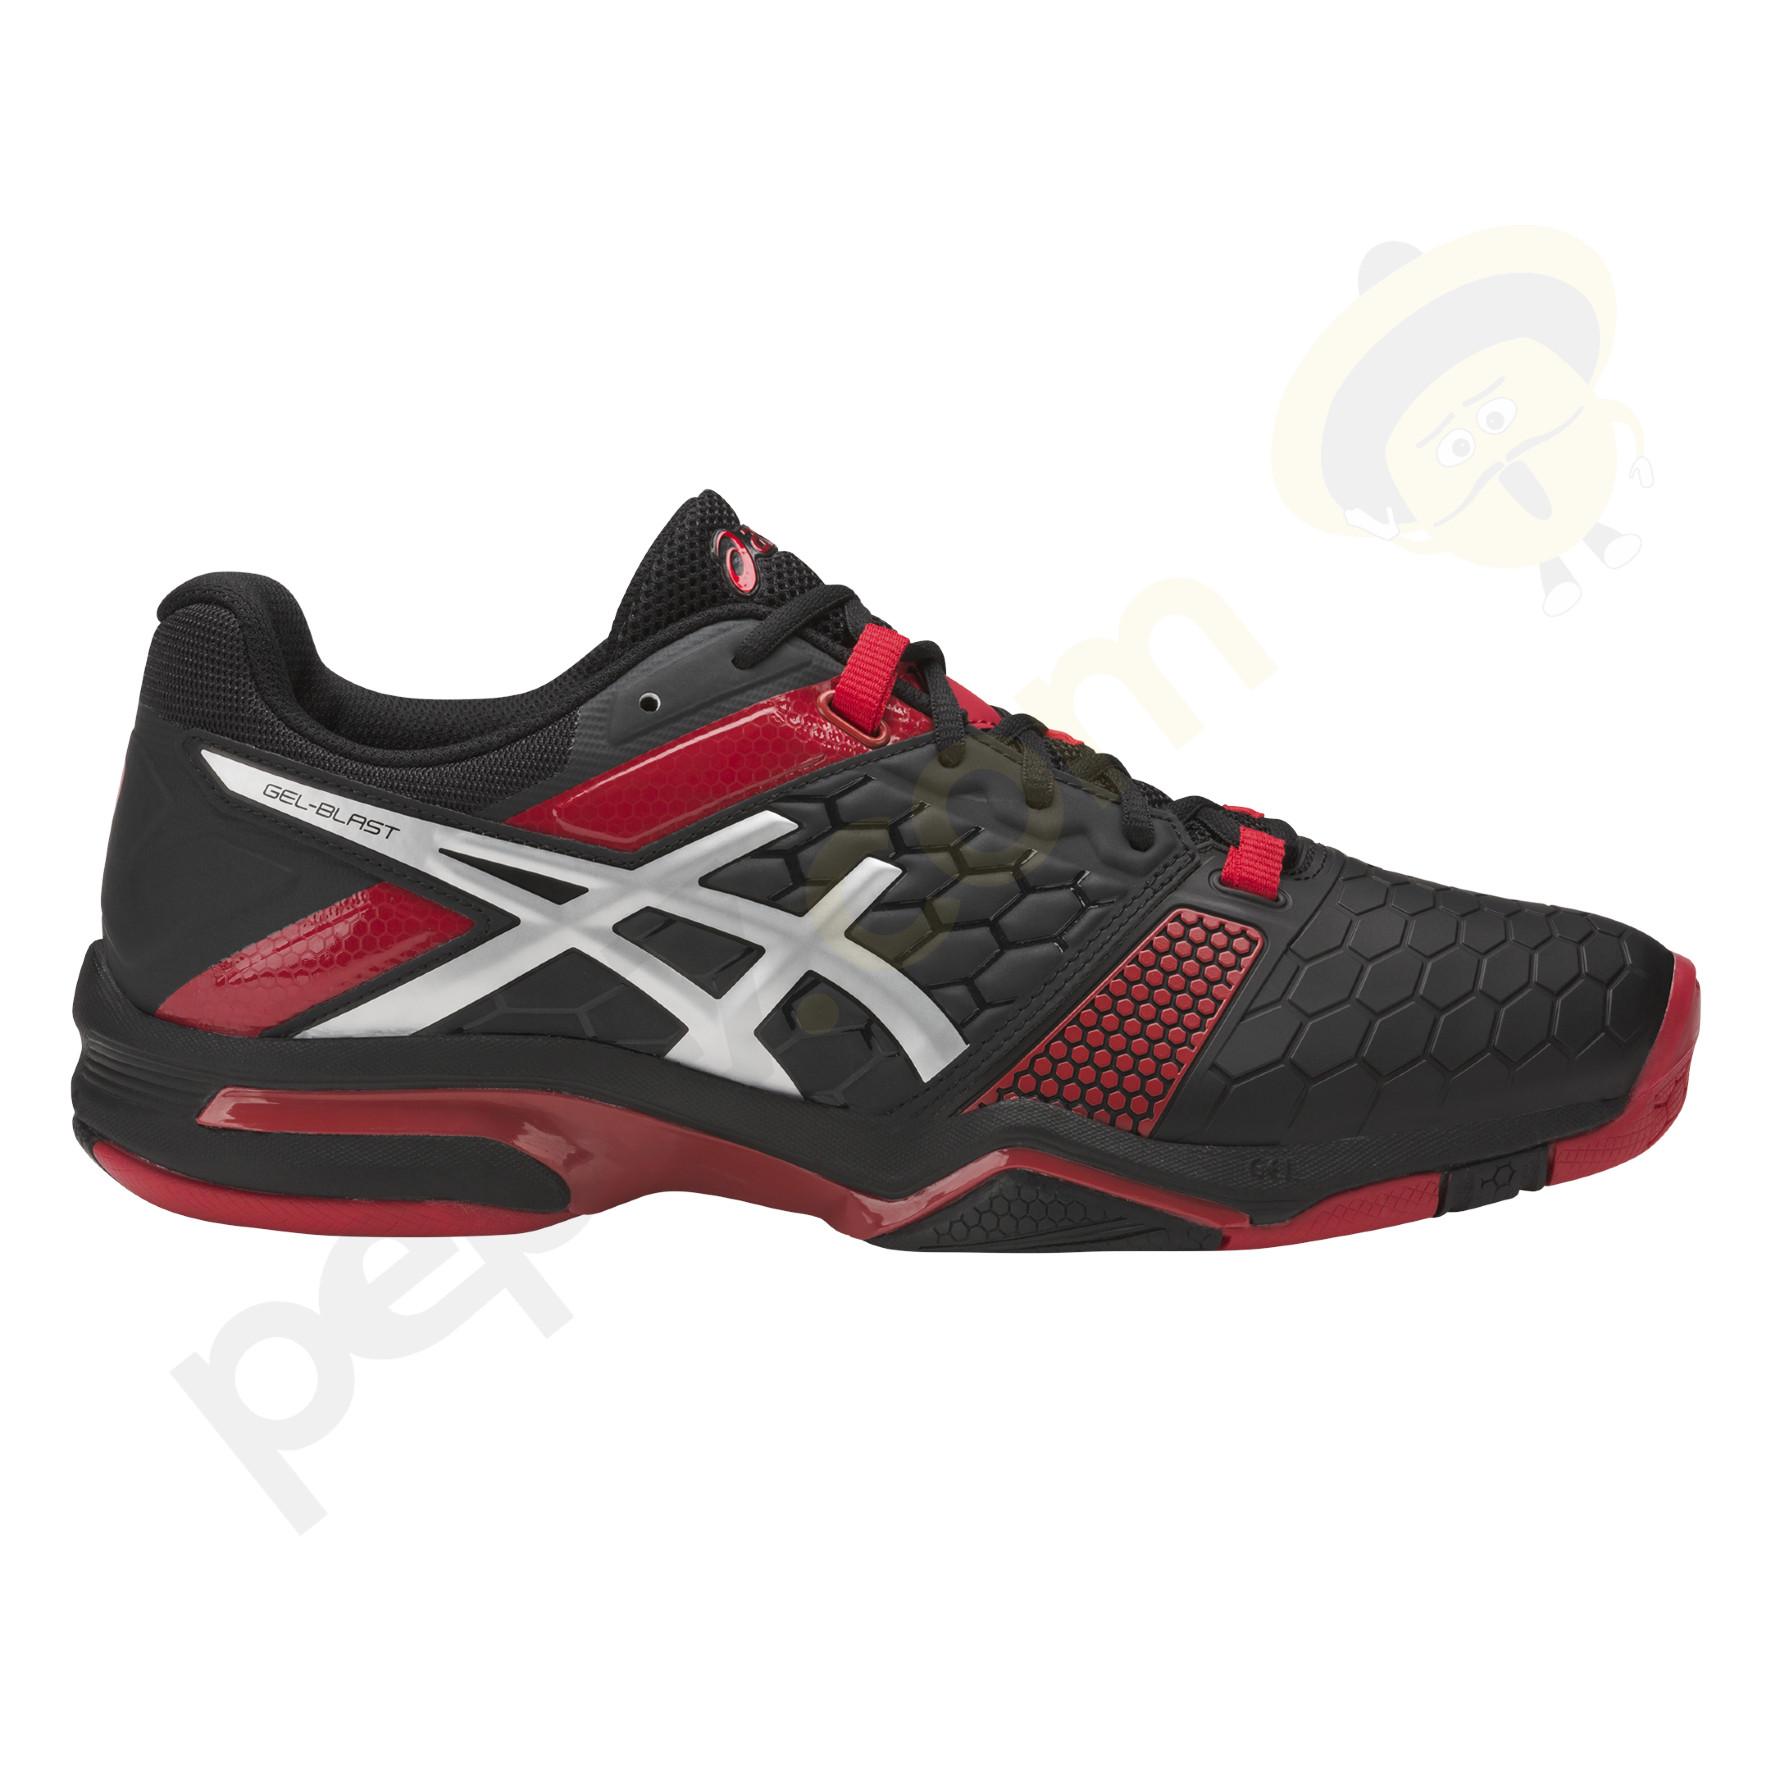 Asics GEL-BLAST 7 Sálová obuv  399b4b6721